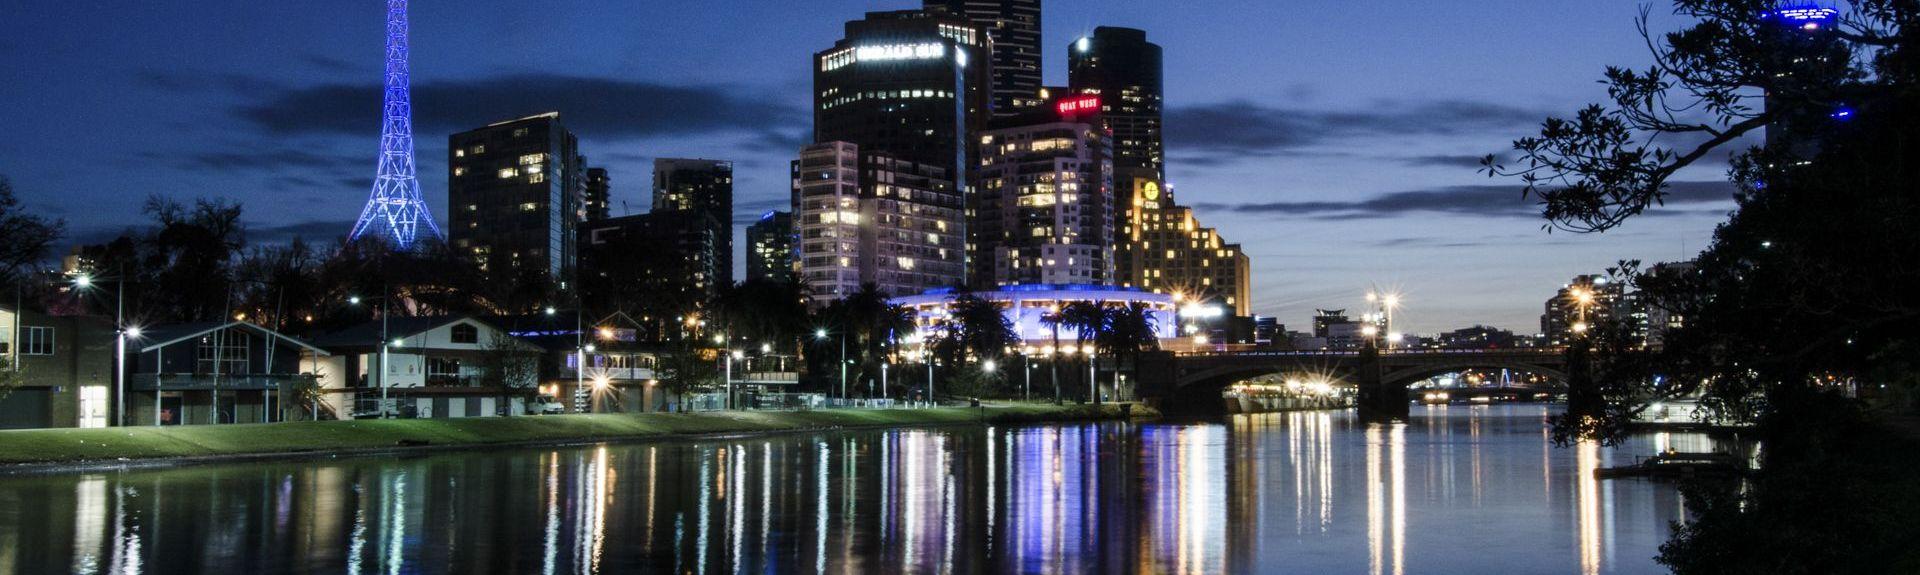 Carlton, Melbourne, Victoria, Australien